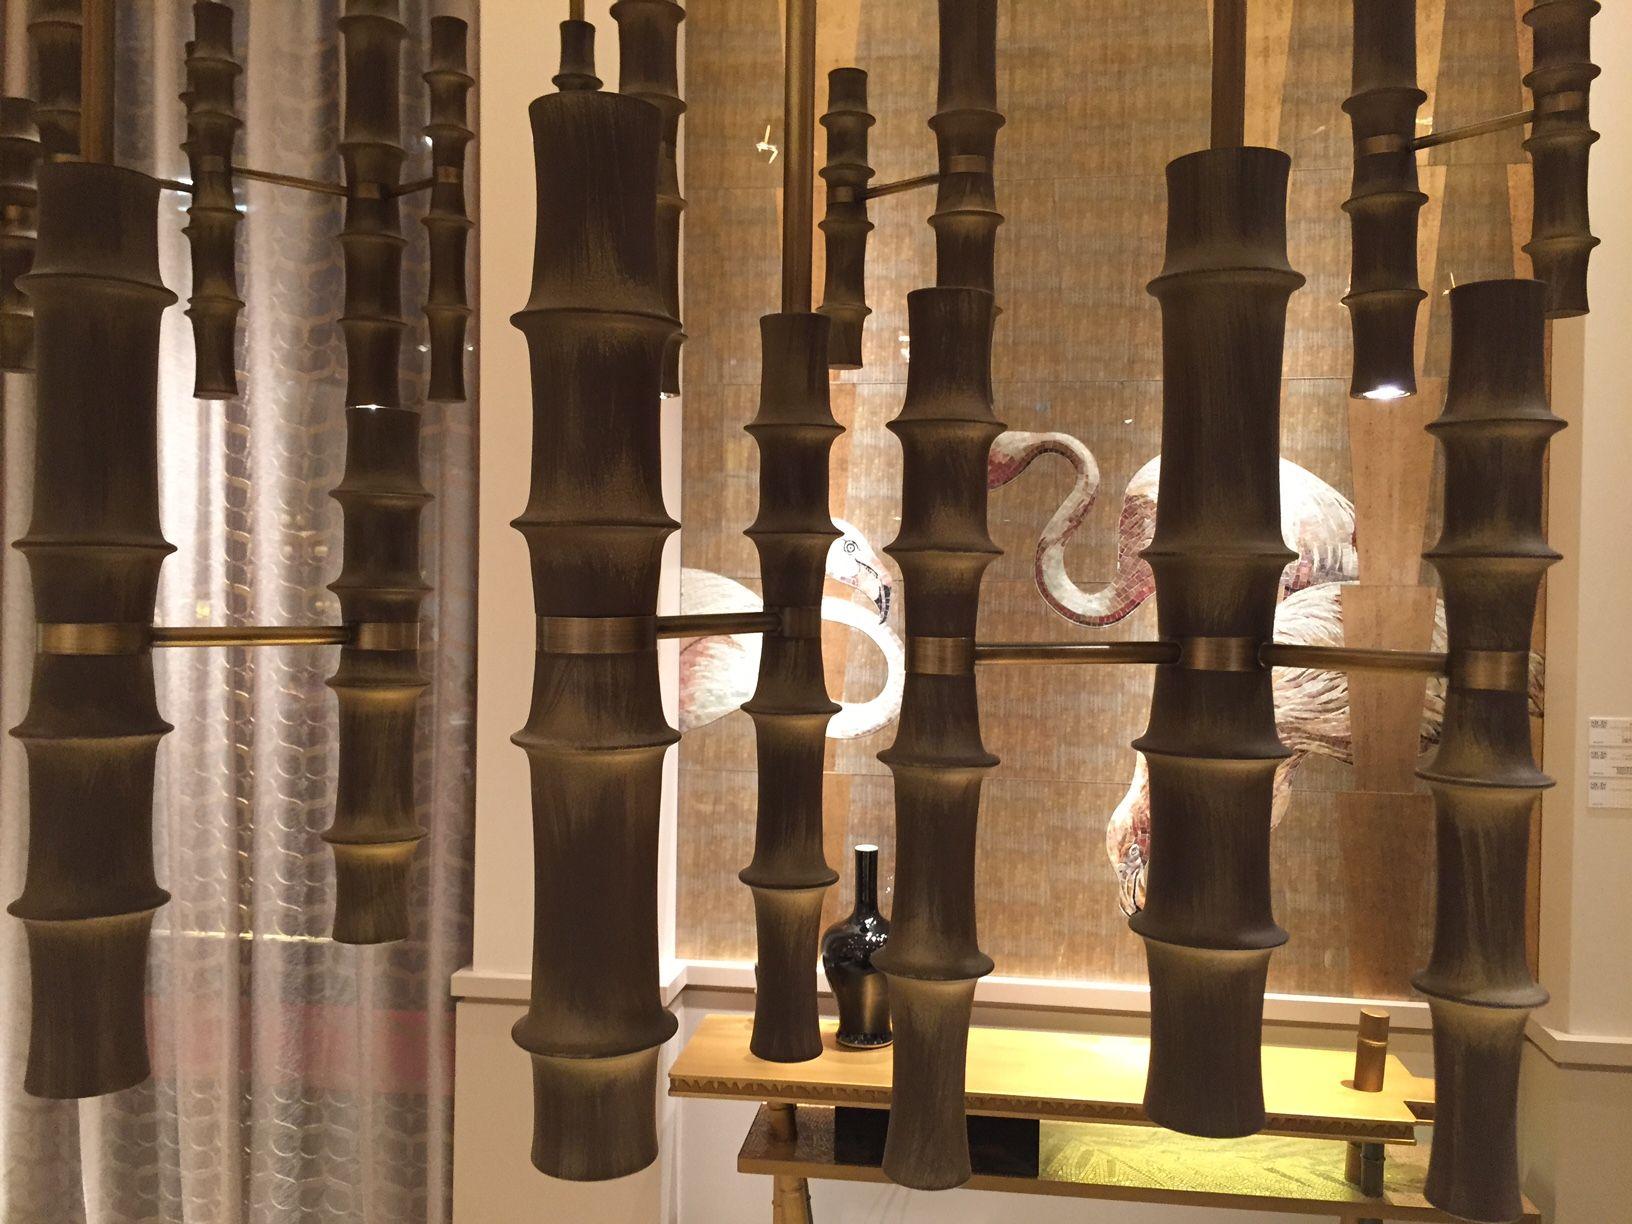 Siam chandelier for SICIS next art - designed by Massimiliano Raggi ...